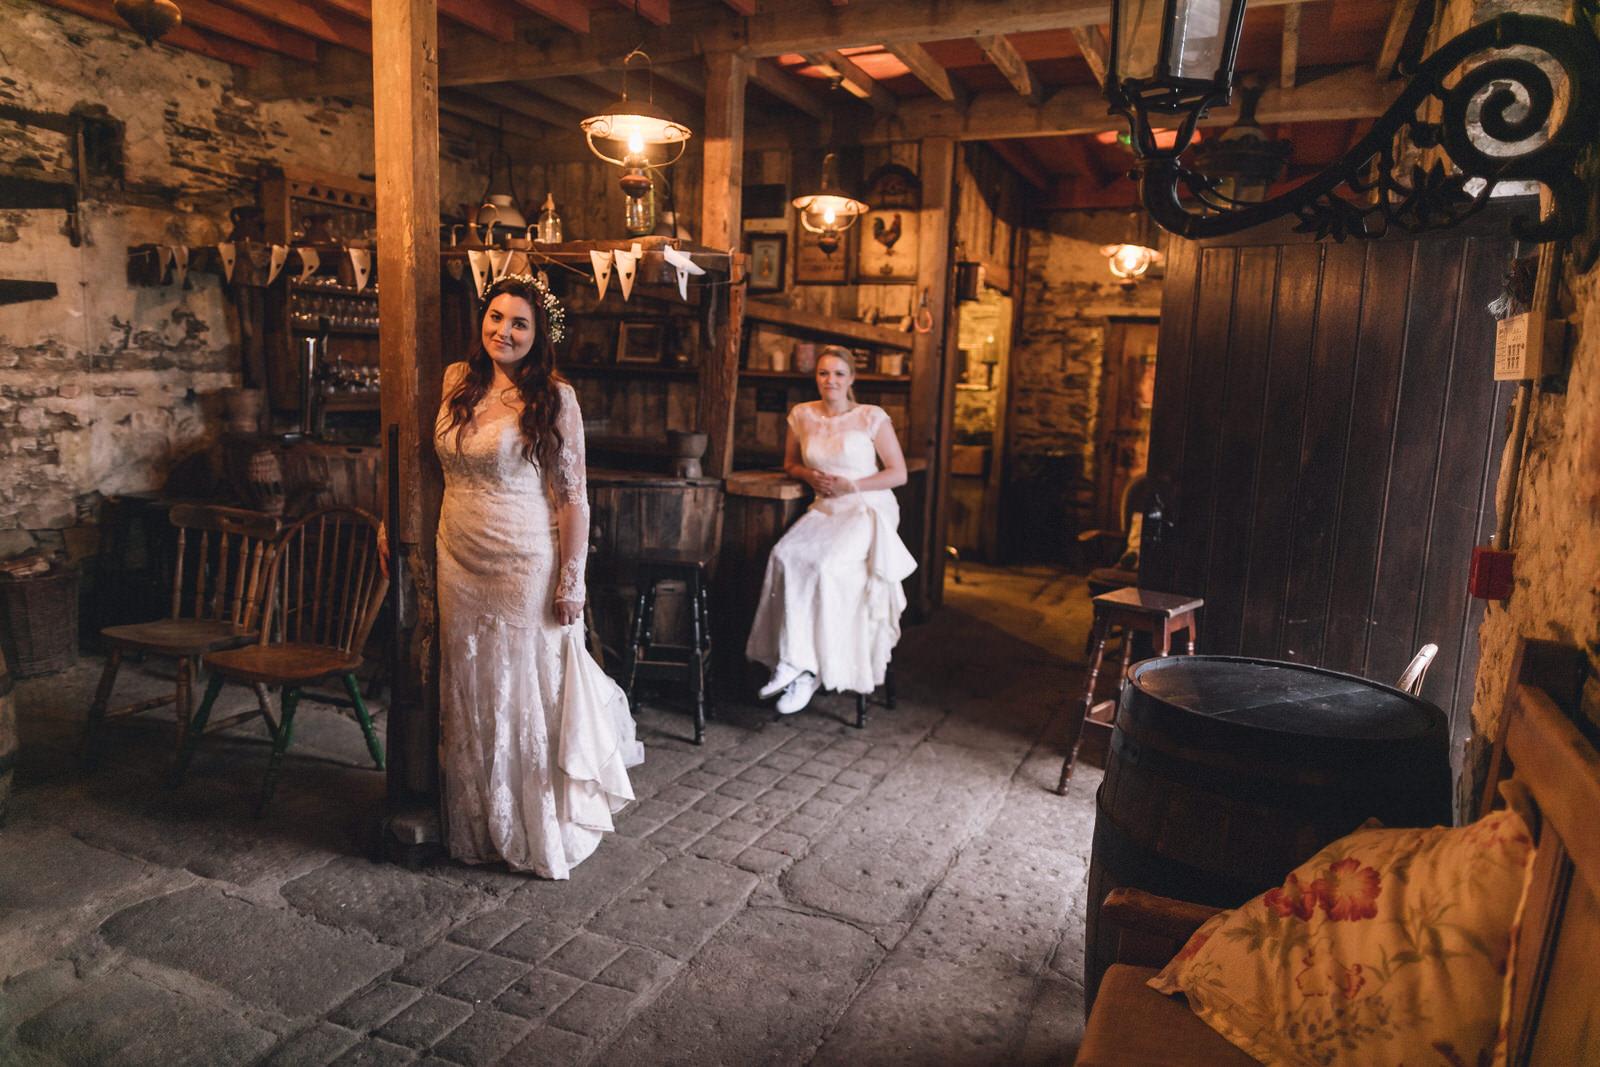 Balybeg-house-ireland-wicklow-wedding-photographer-roger-kenny_greystones097.jpg